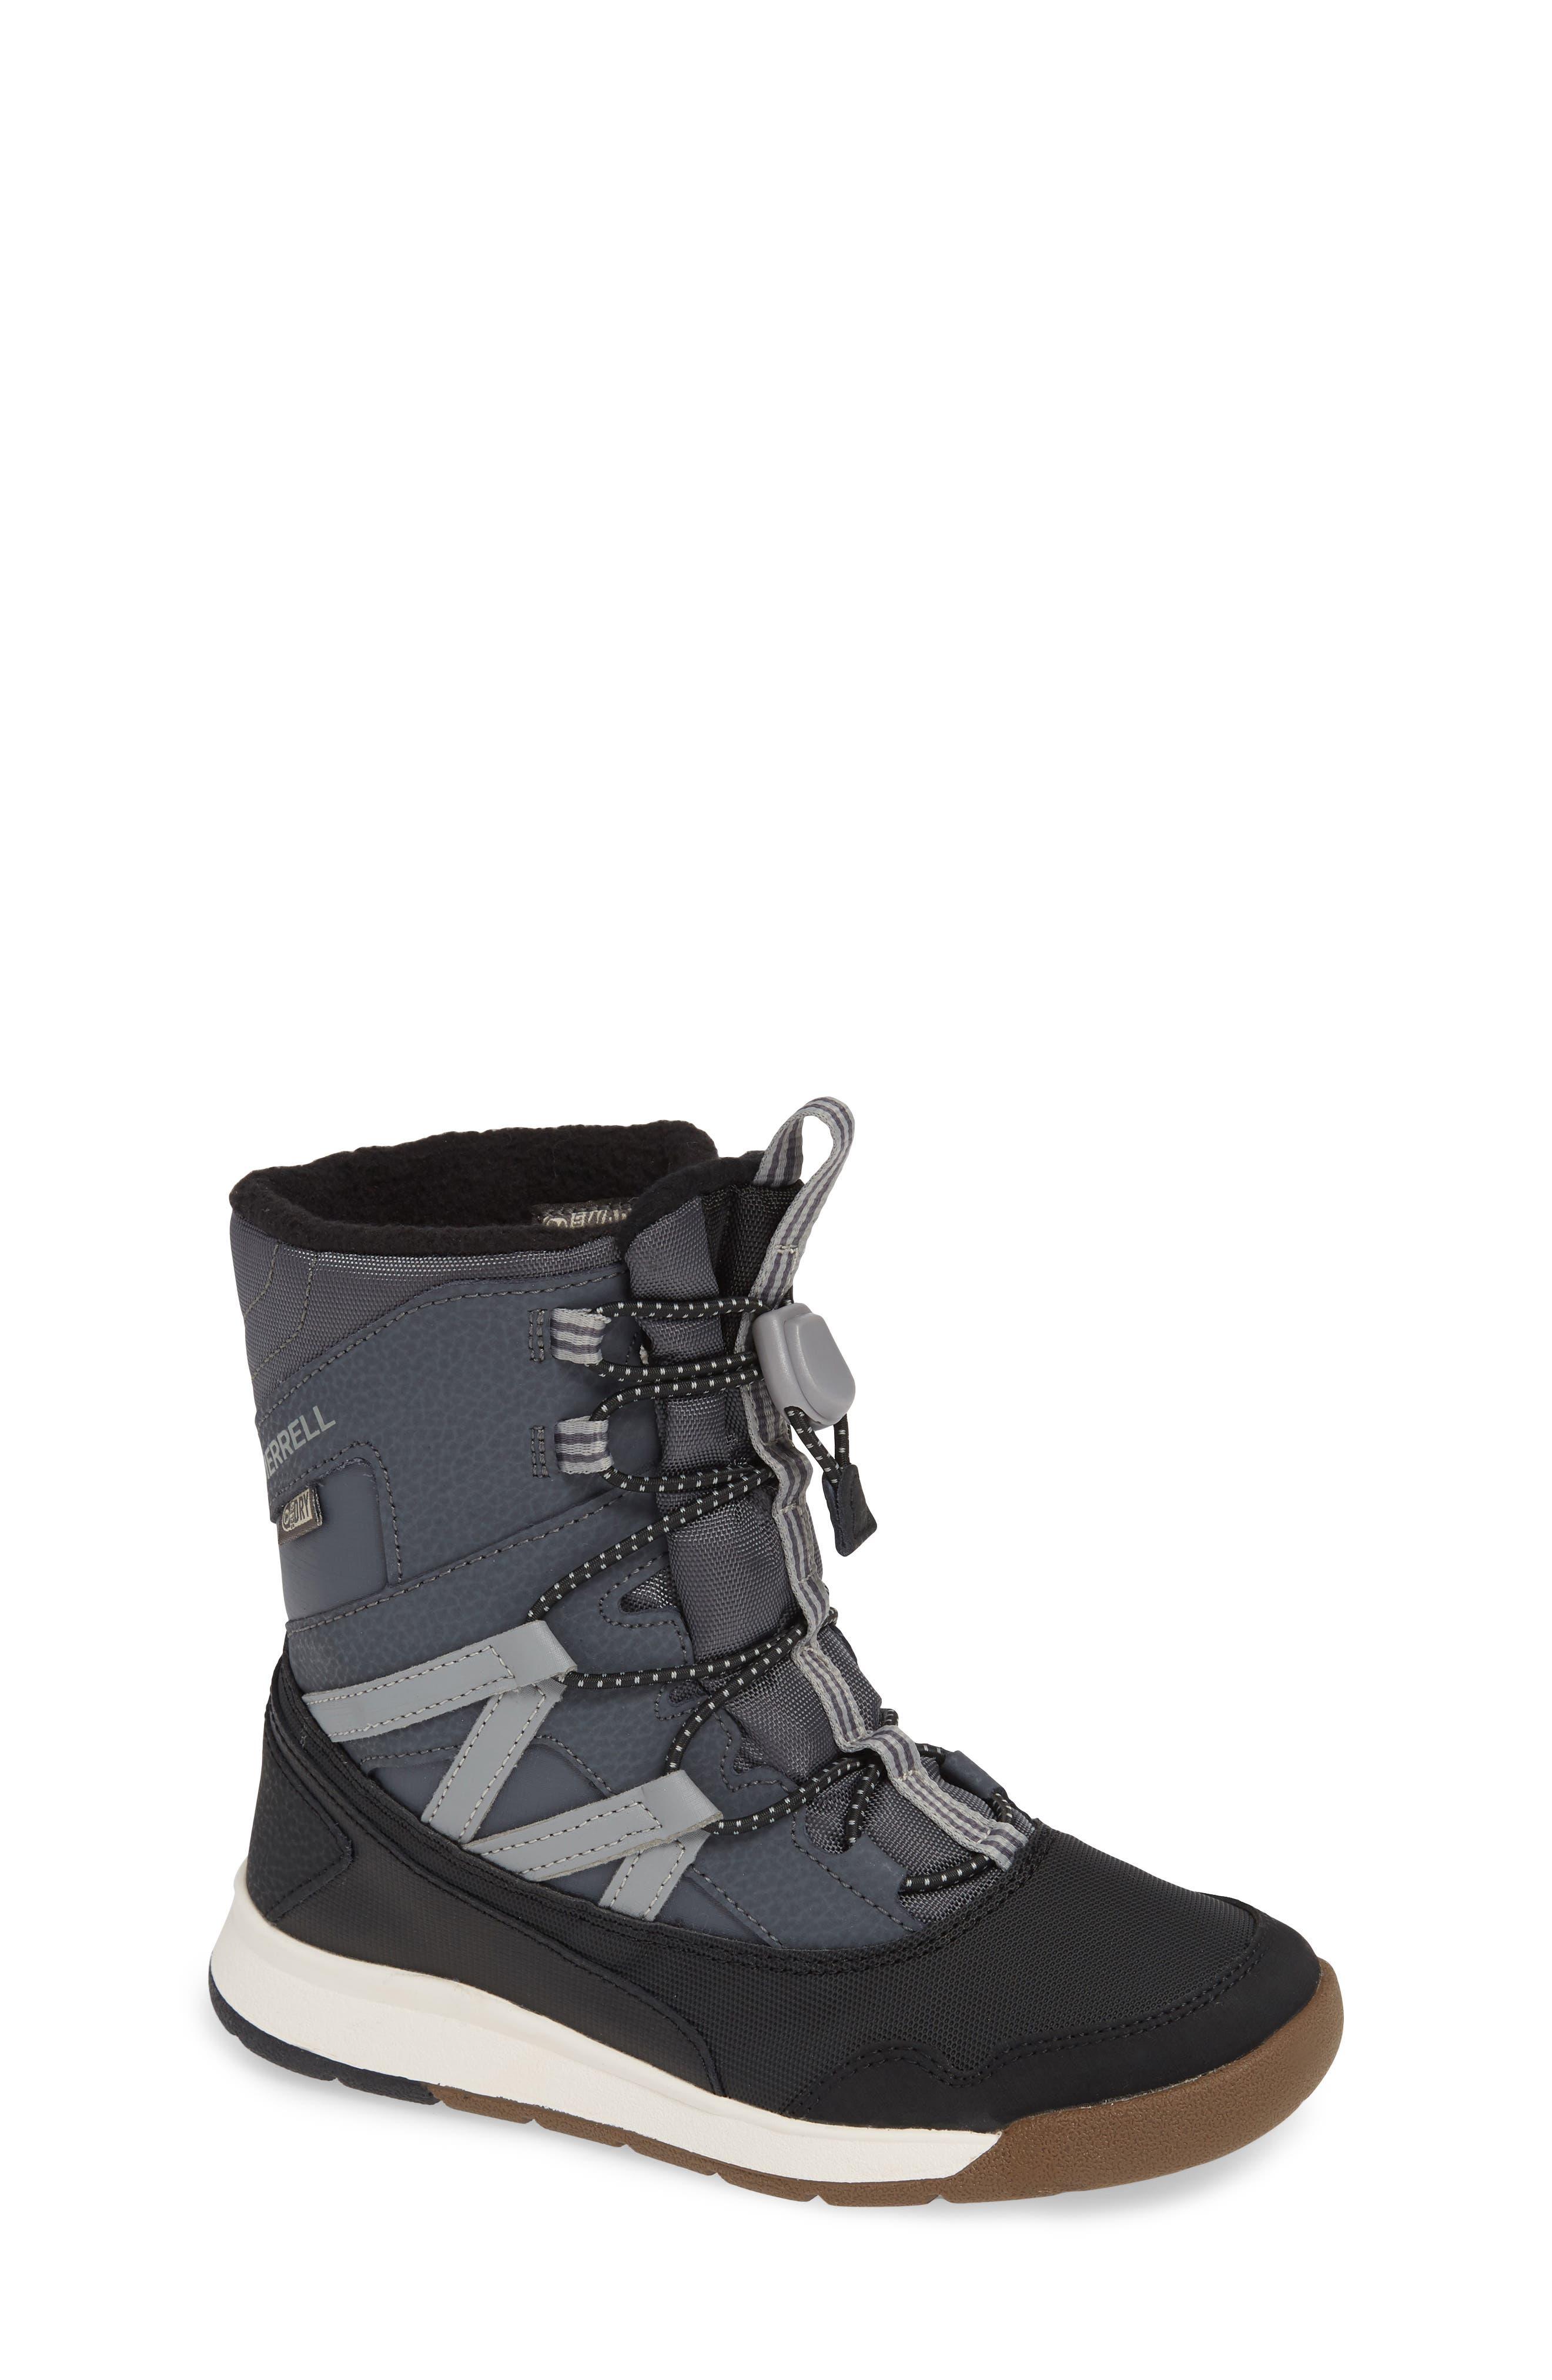 Snow Crush Waterproof Snow Boot,                             Main thumbnail 1, color,                             020